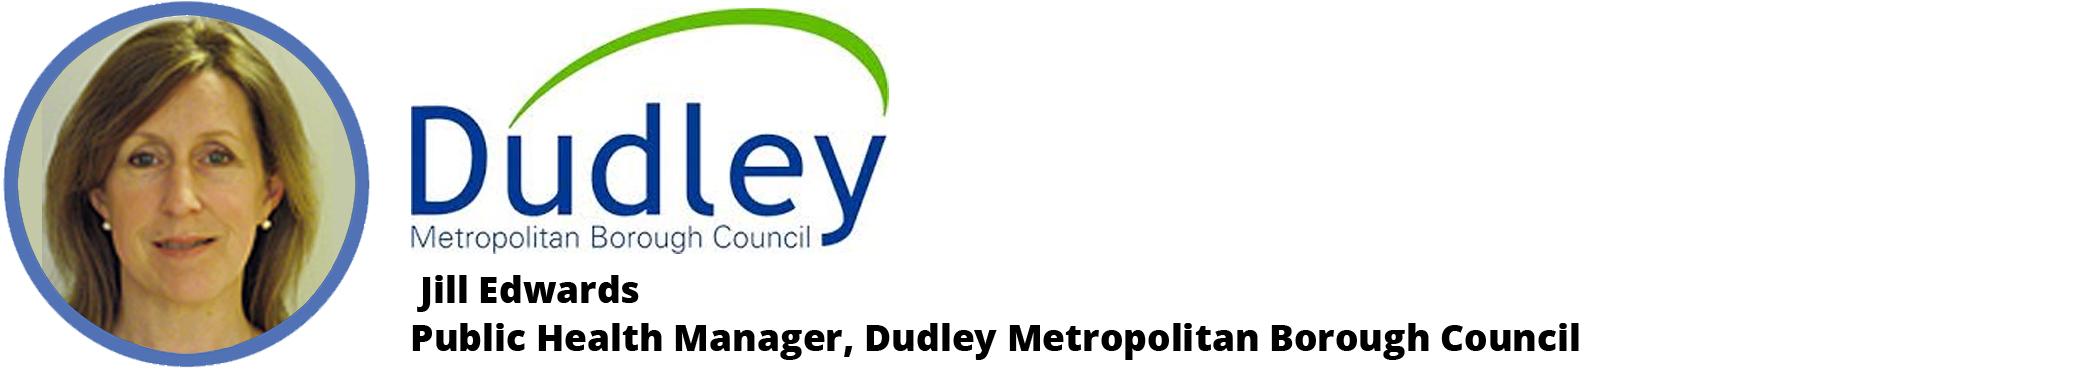 Jill Edwards - Public Health Manager, Dudley MBC